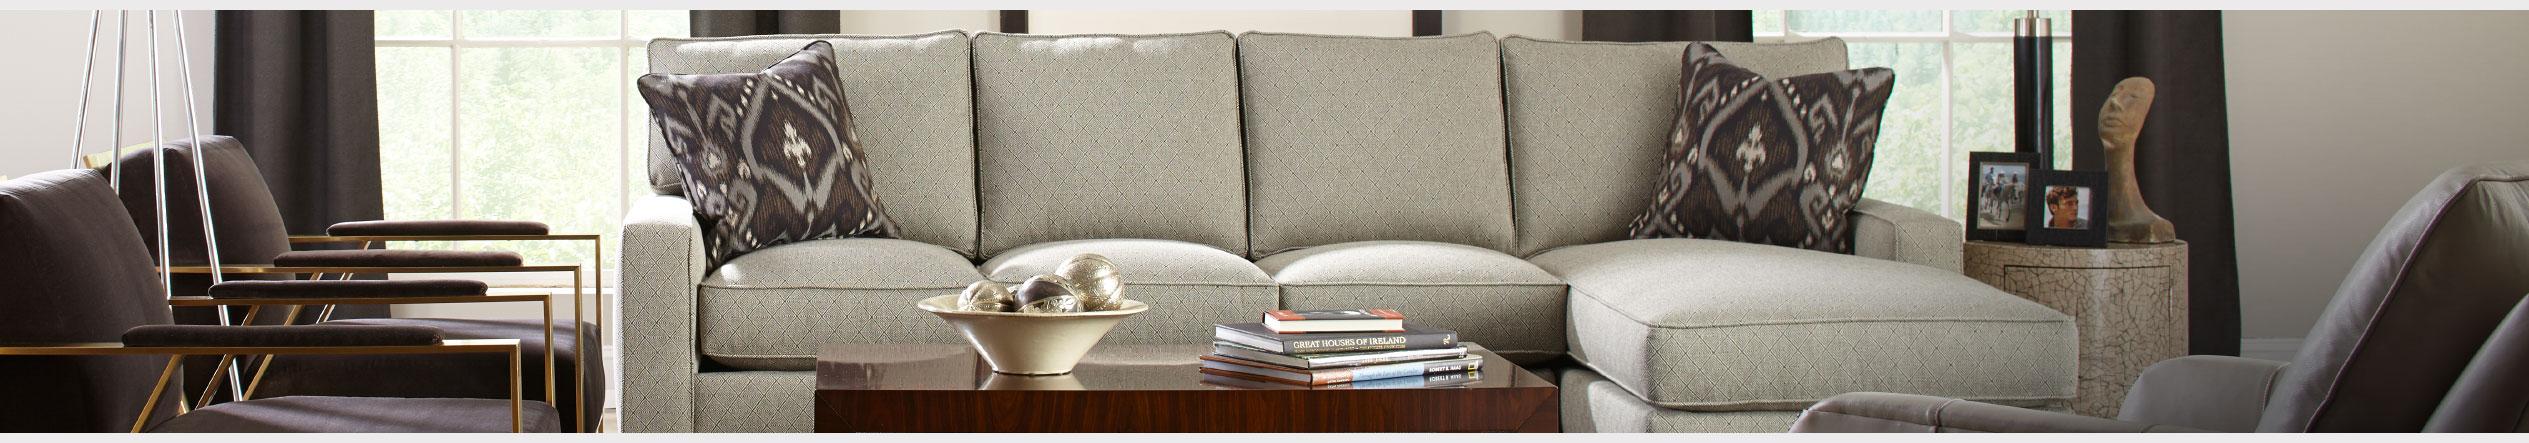 Delivery Policies At Jordan S Furniture